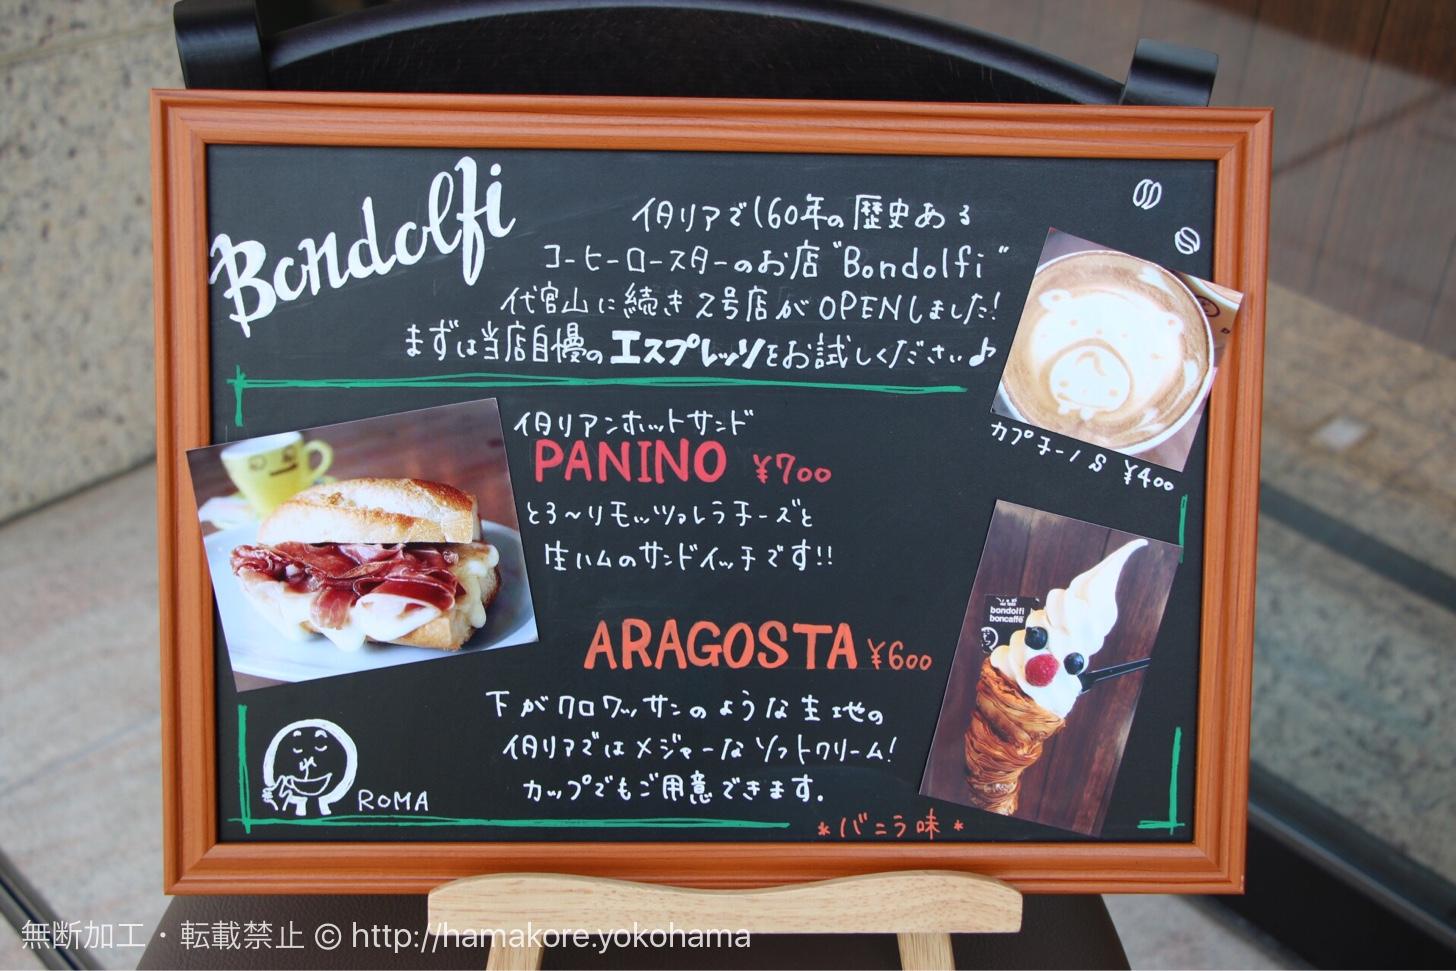 Bondolfi boncaffe(ボンドルフィボンカフェ) 店頭メニュー